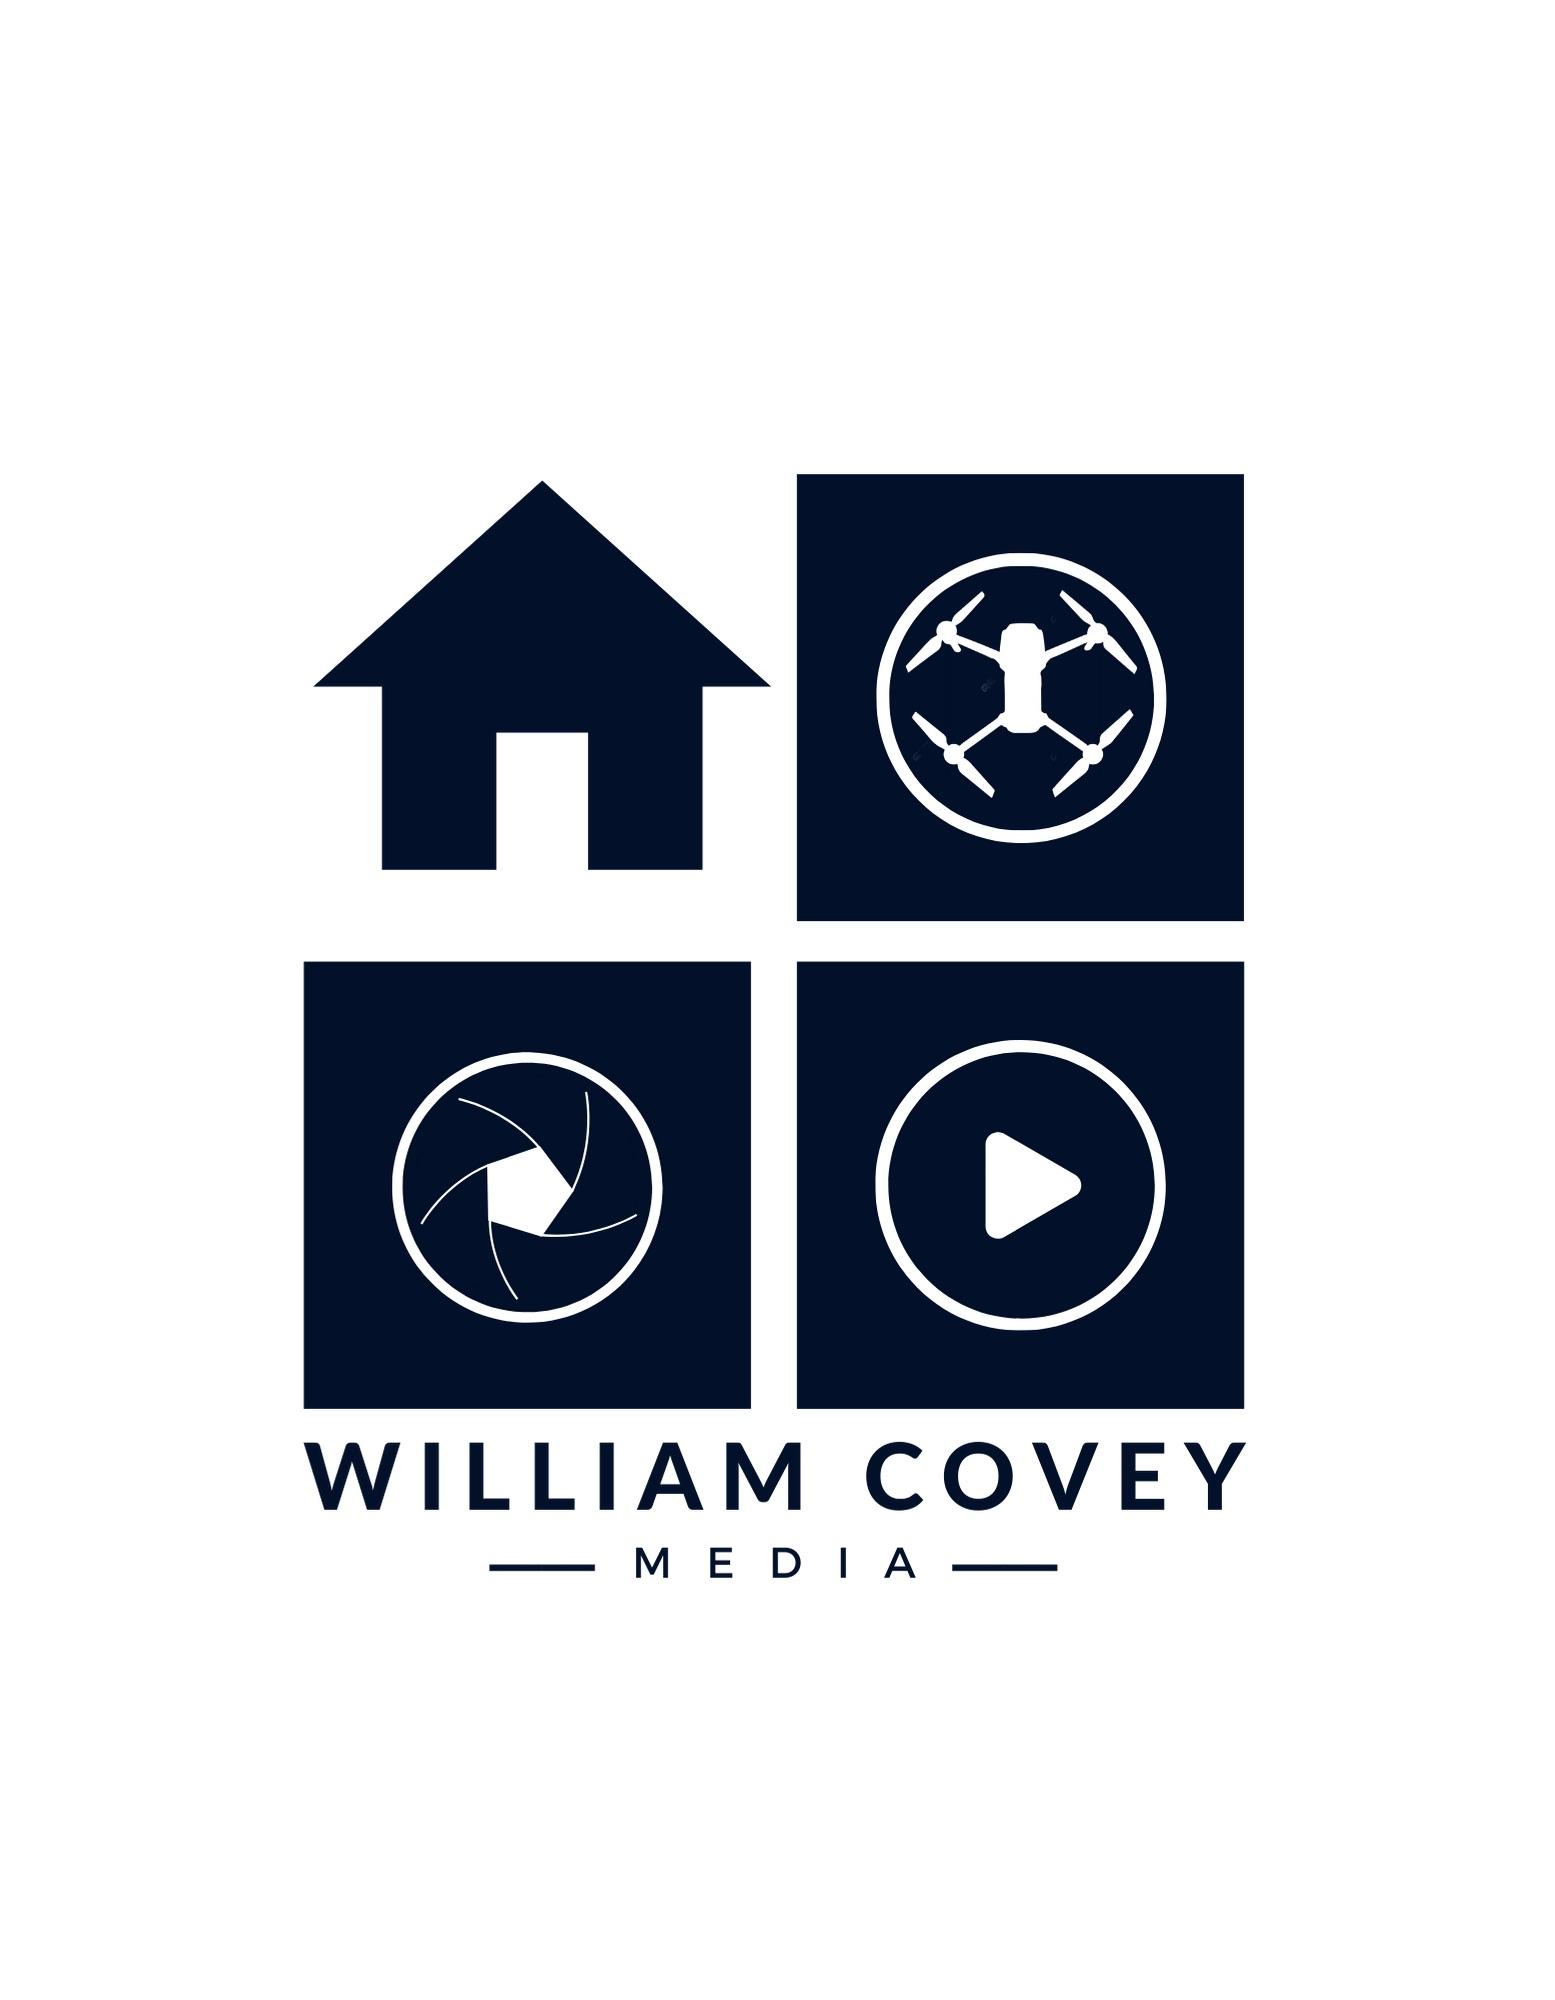 William Covey Media floor plan in Myrtle Beach